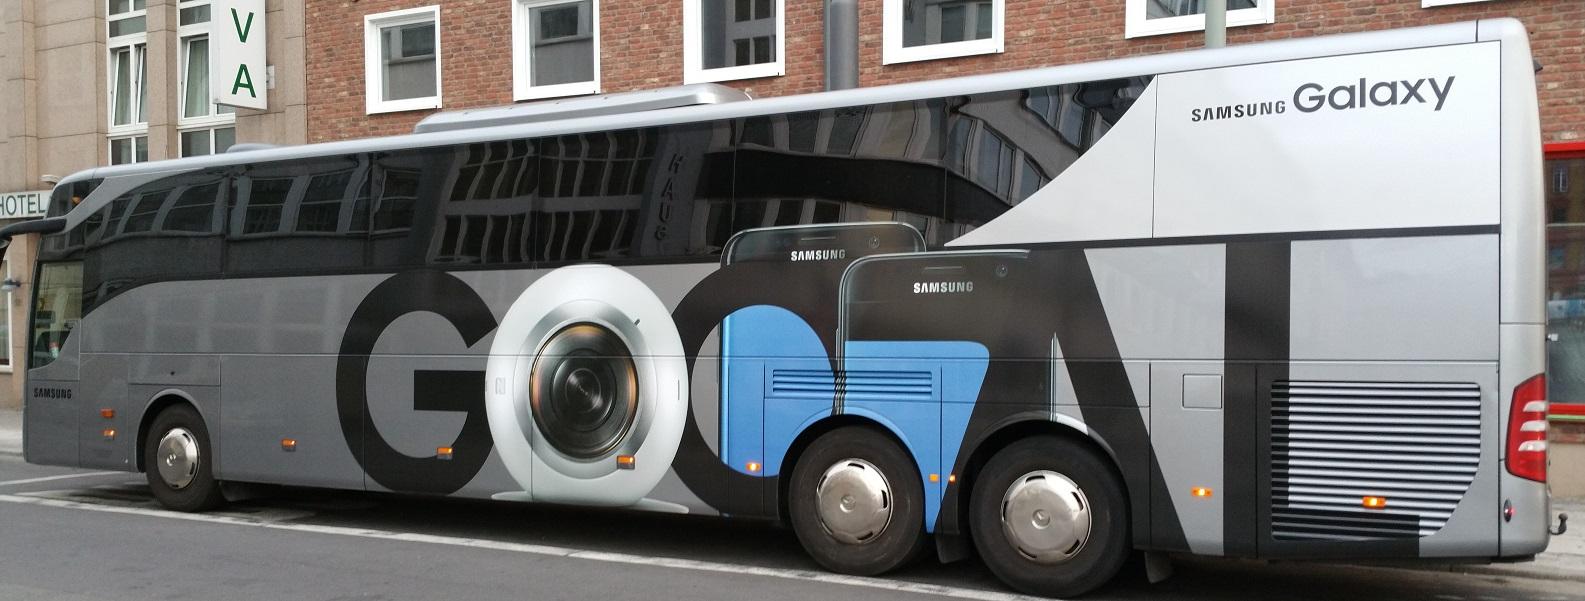 Samsung Euro 2016 Bus